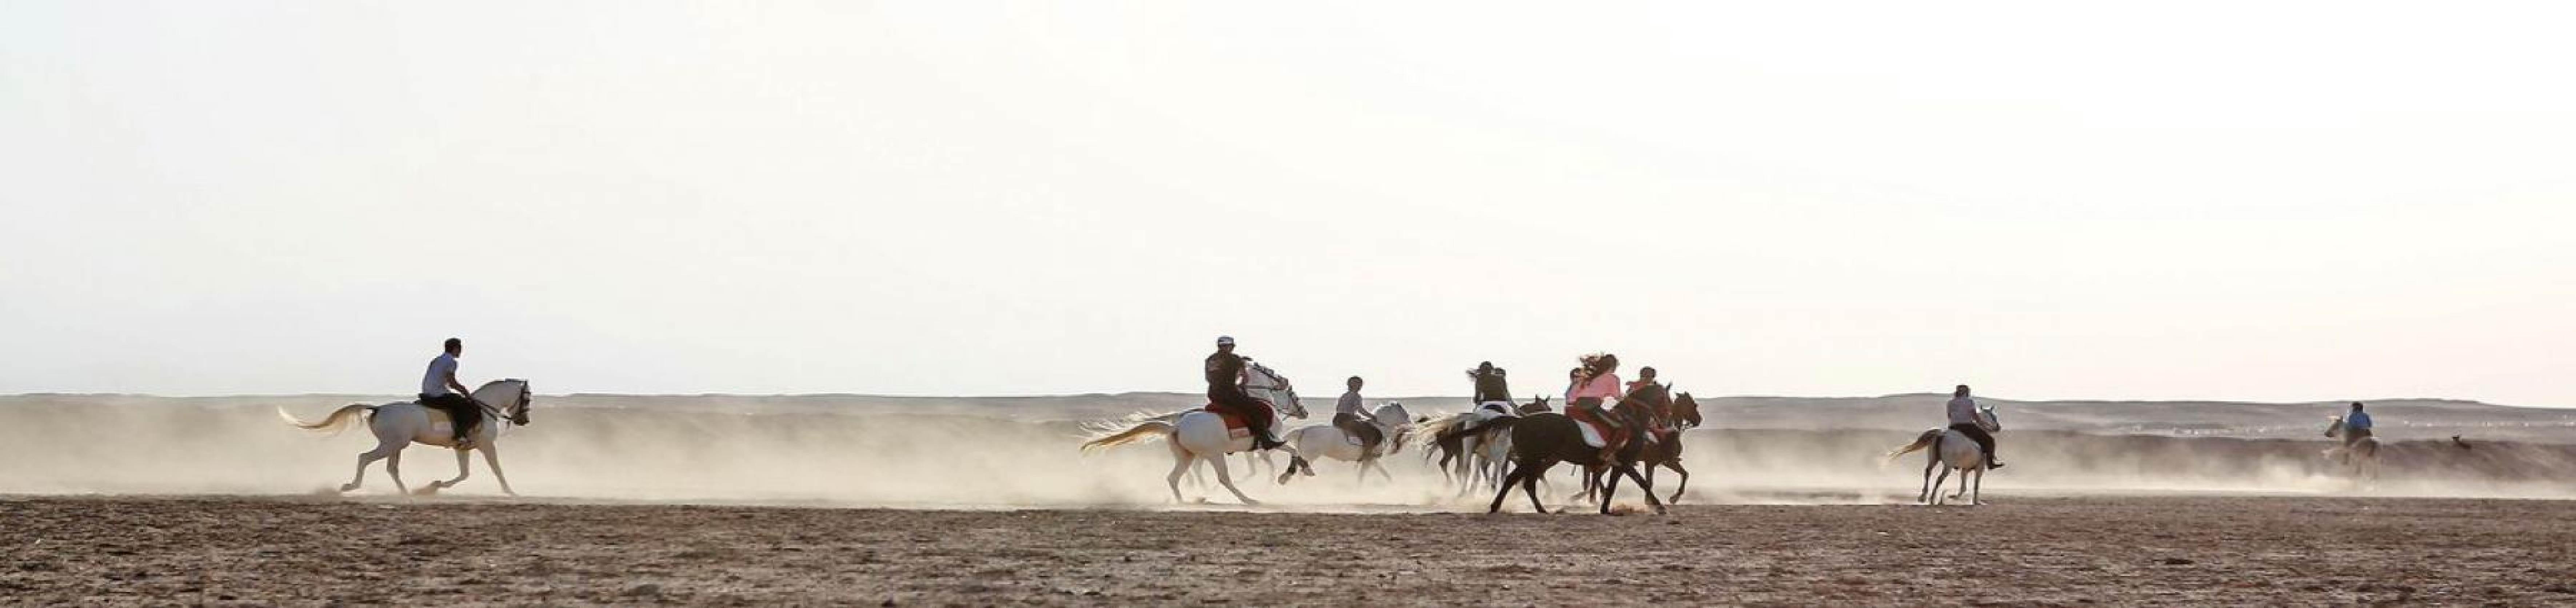 Horseback Riding: Best Horse Riding Tours around the world